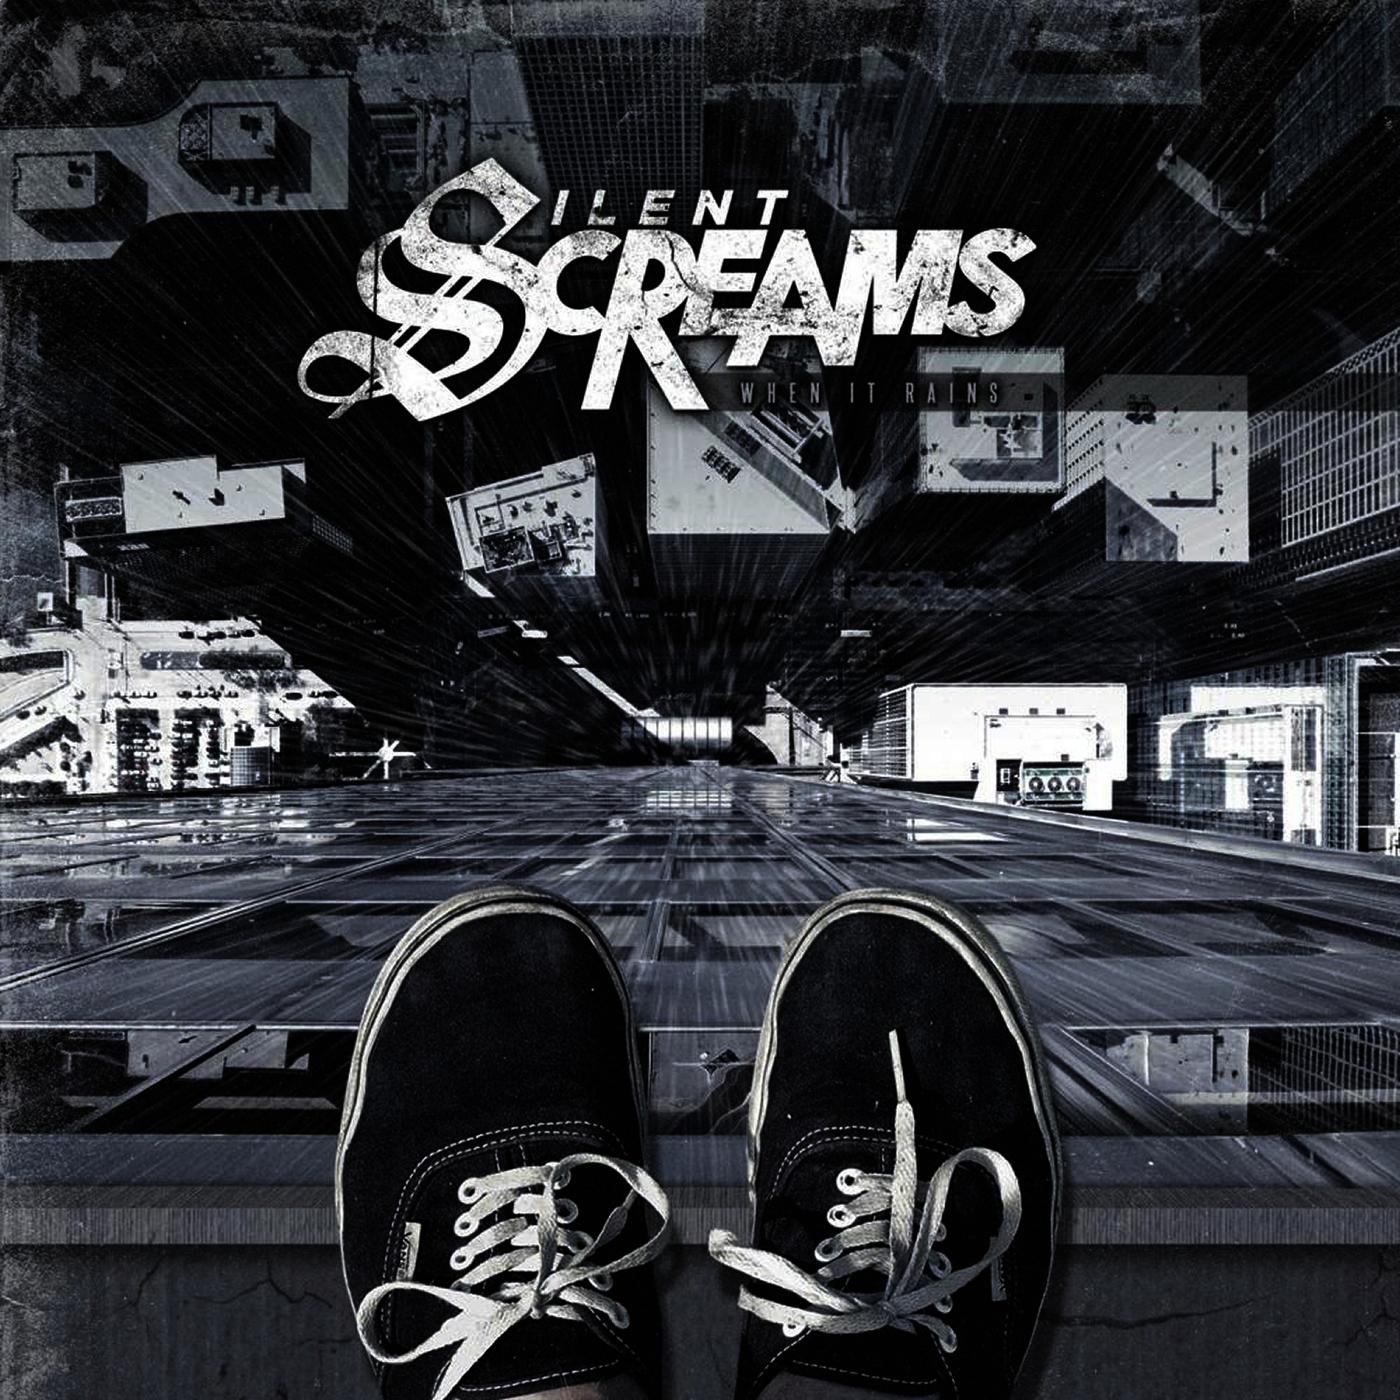 Silent Screams - When It Rains (2011)